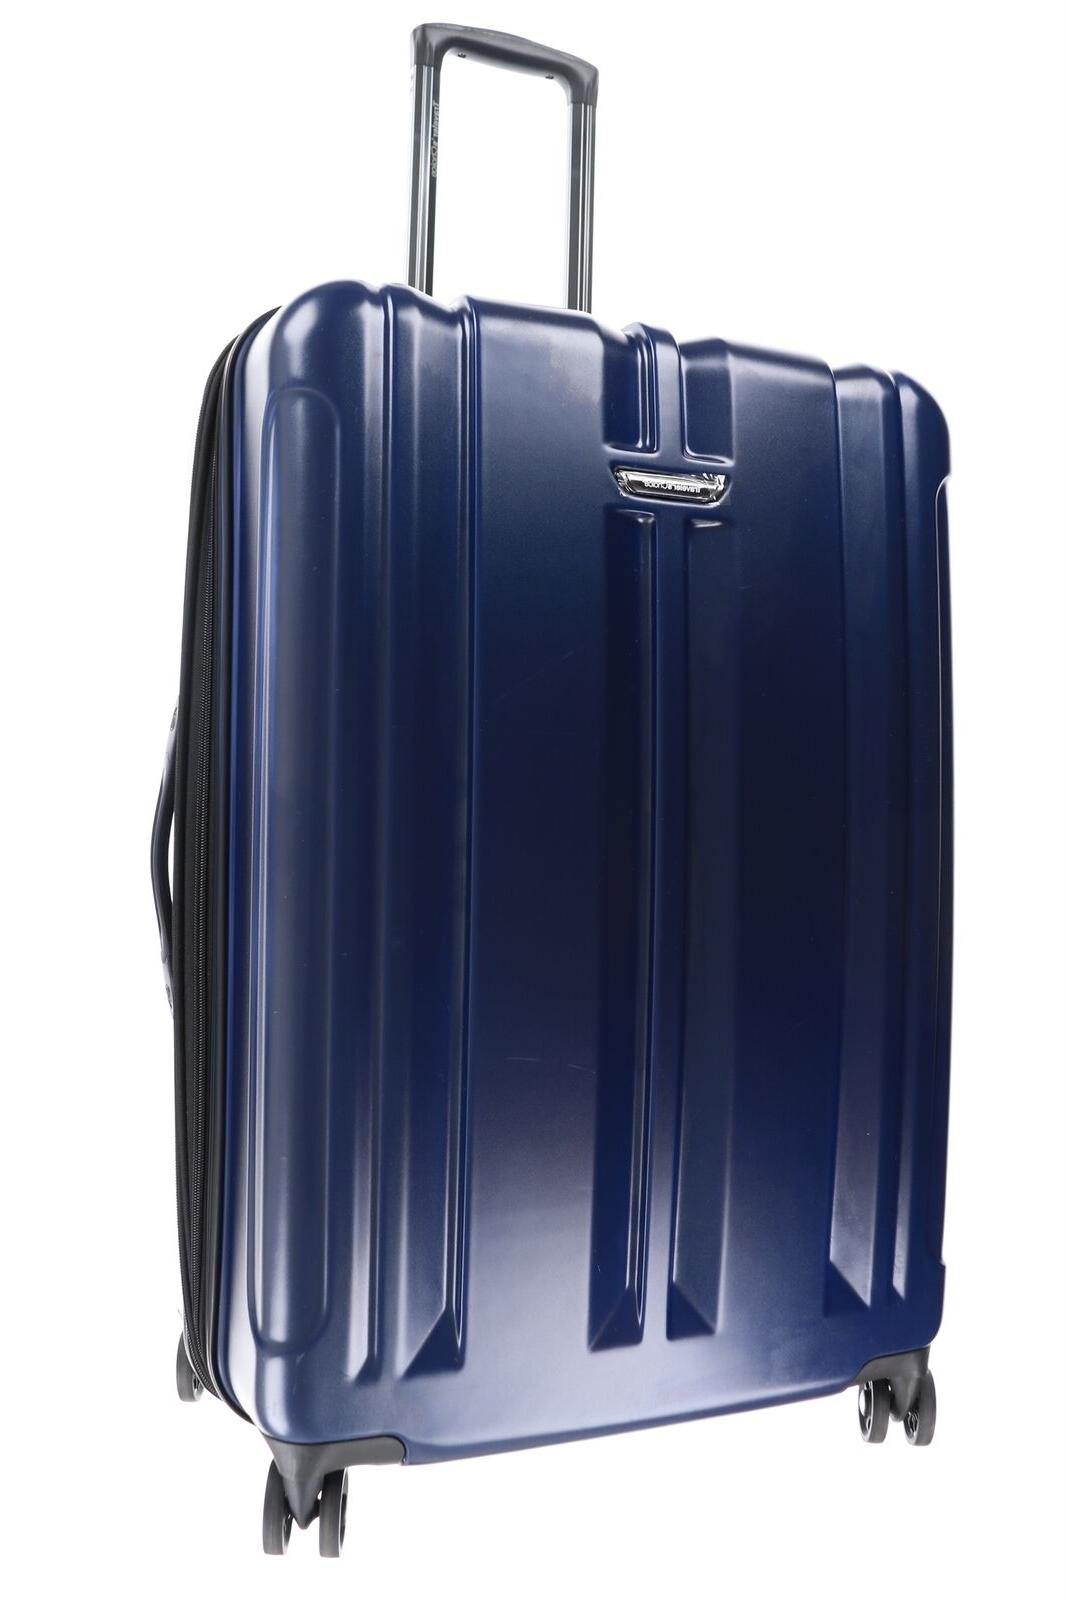 traveler s choice 159729 navy blue hard